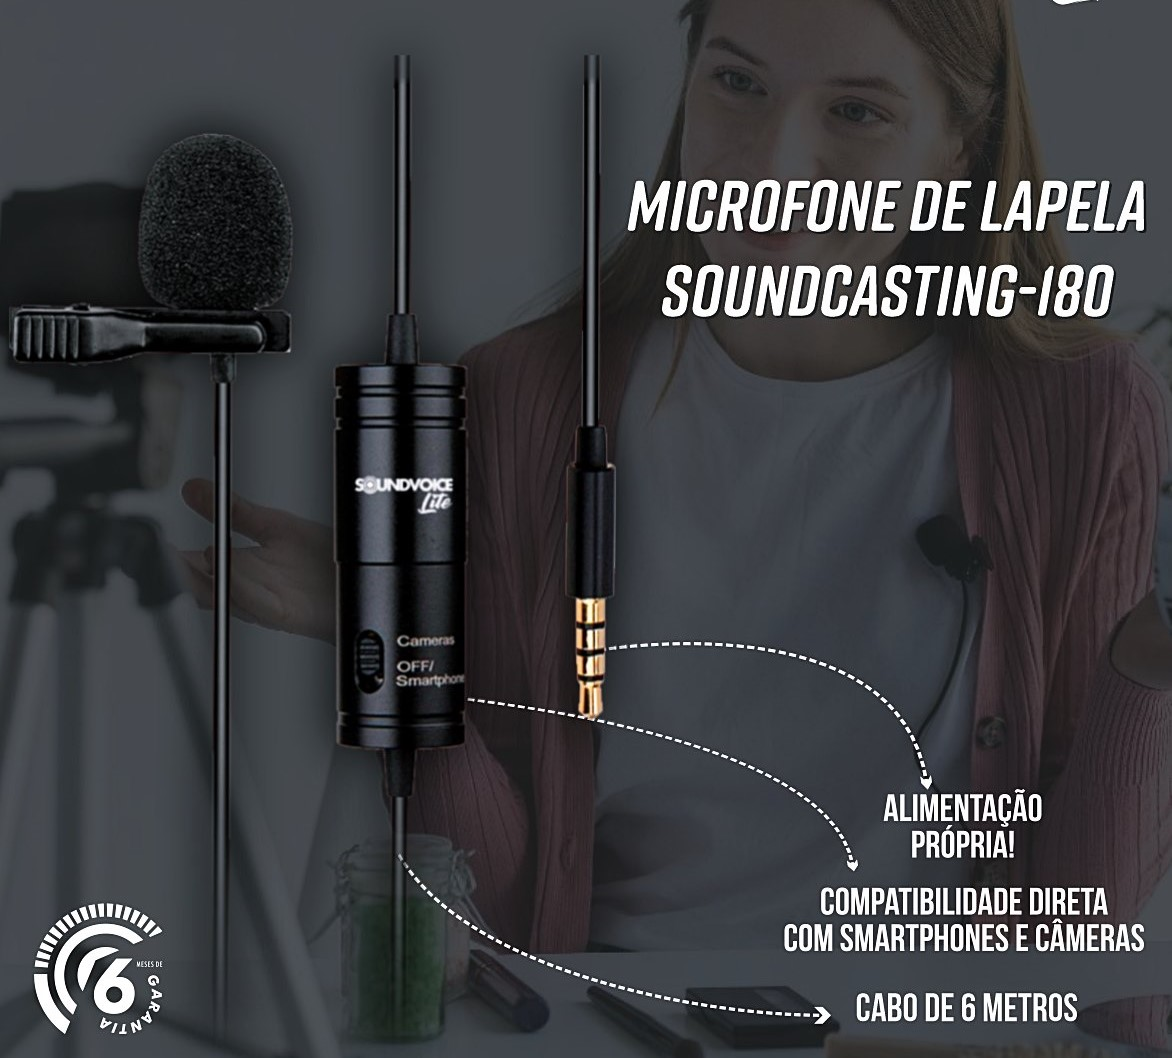 MICROFONE lapela SOUNDVOICE SOUNDCASTING-180